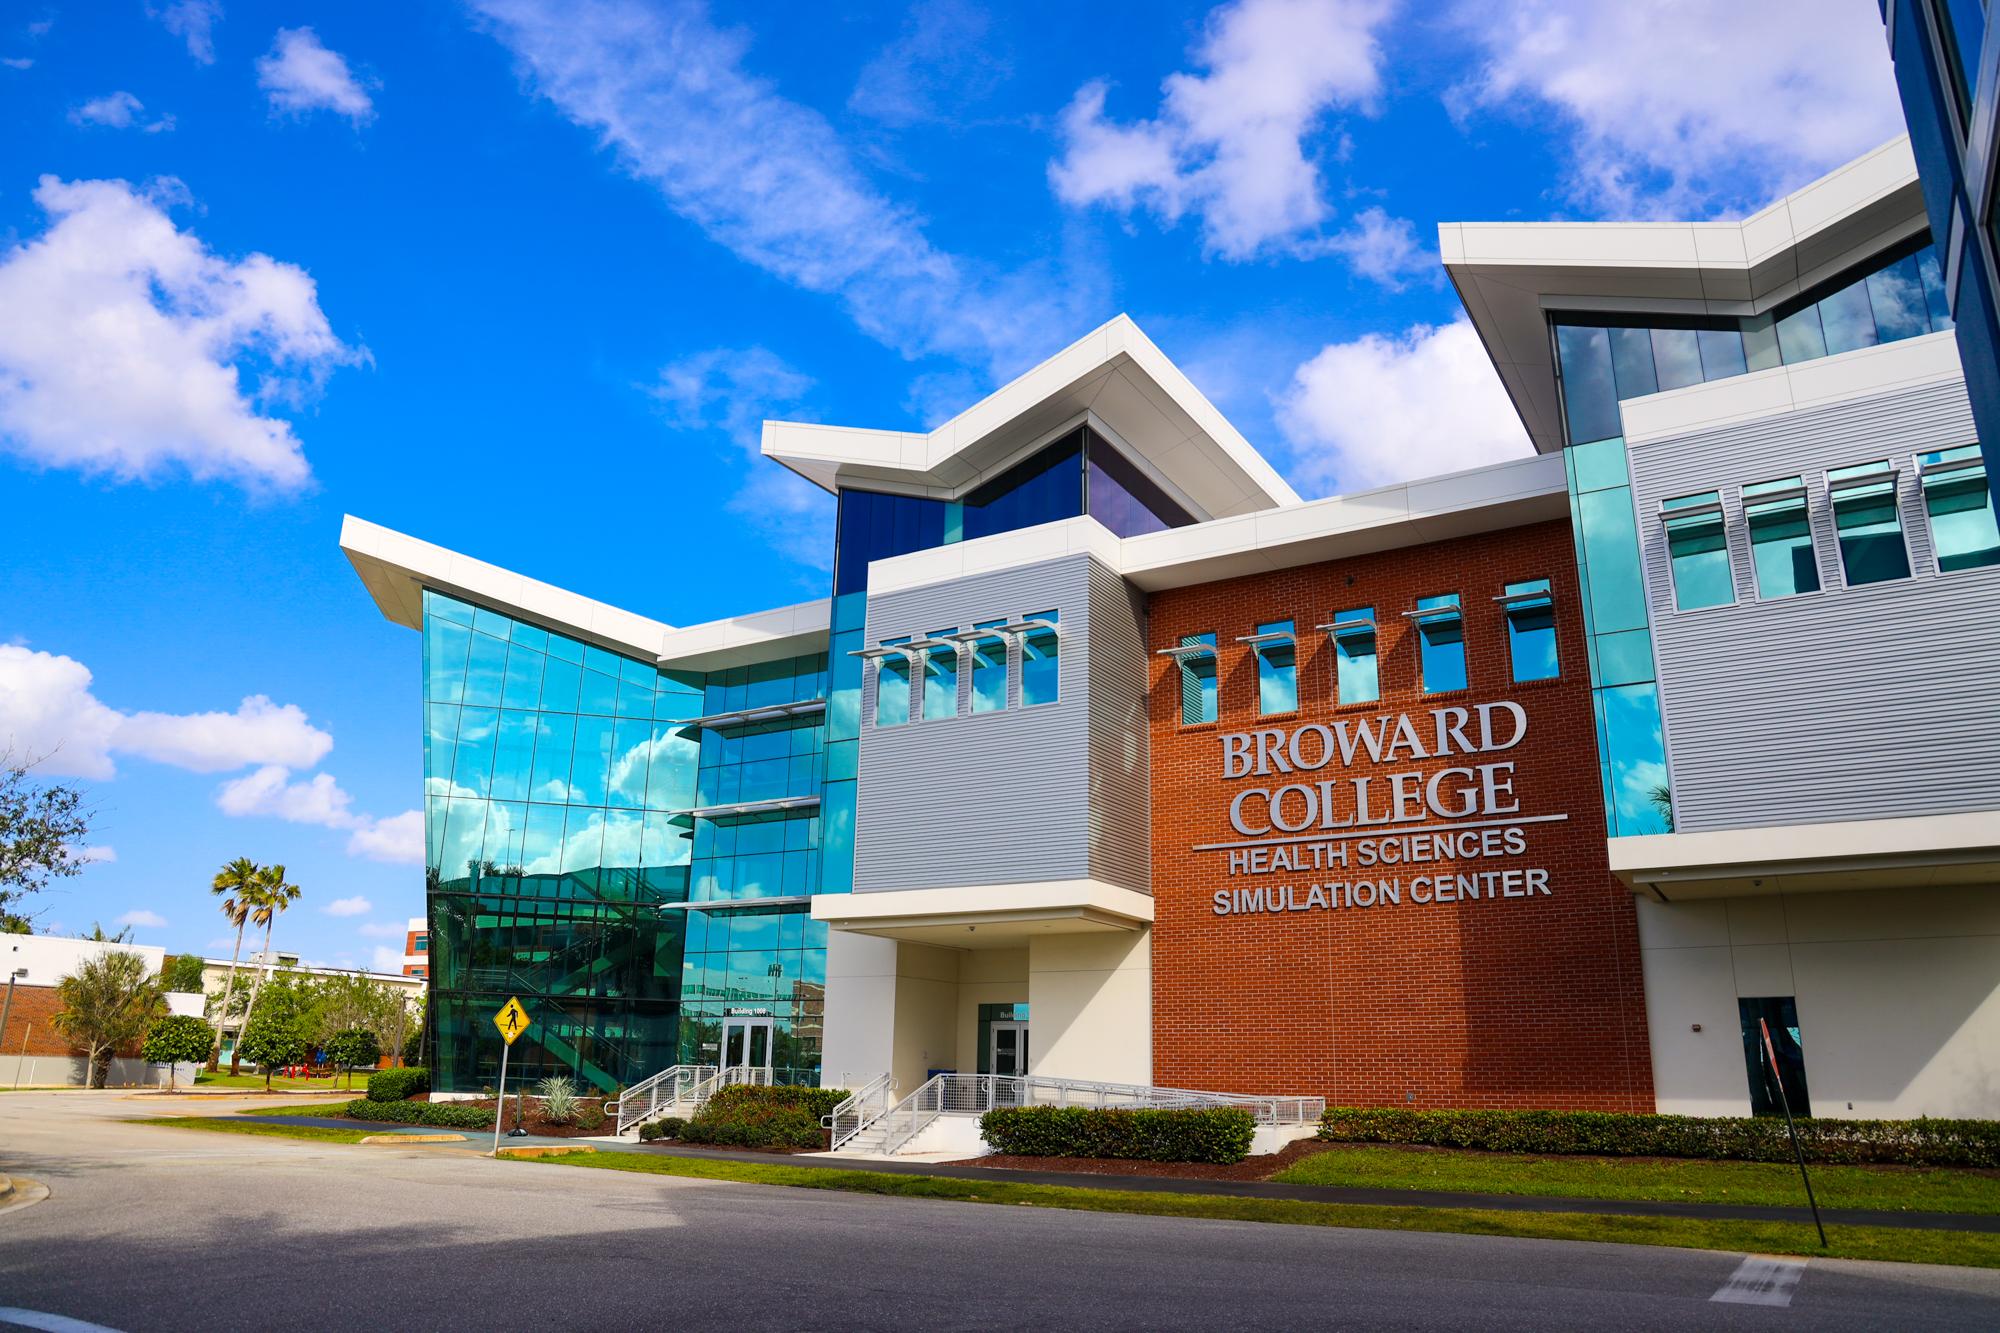 Broward College Health Sciences Simulation Center